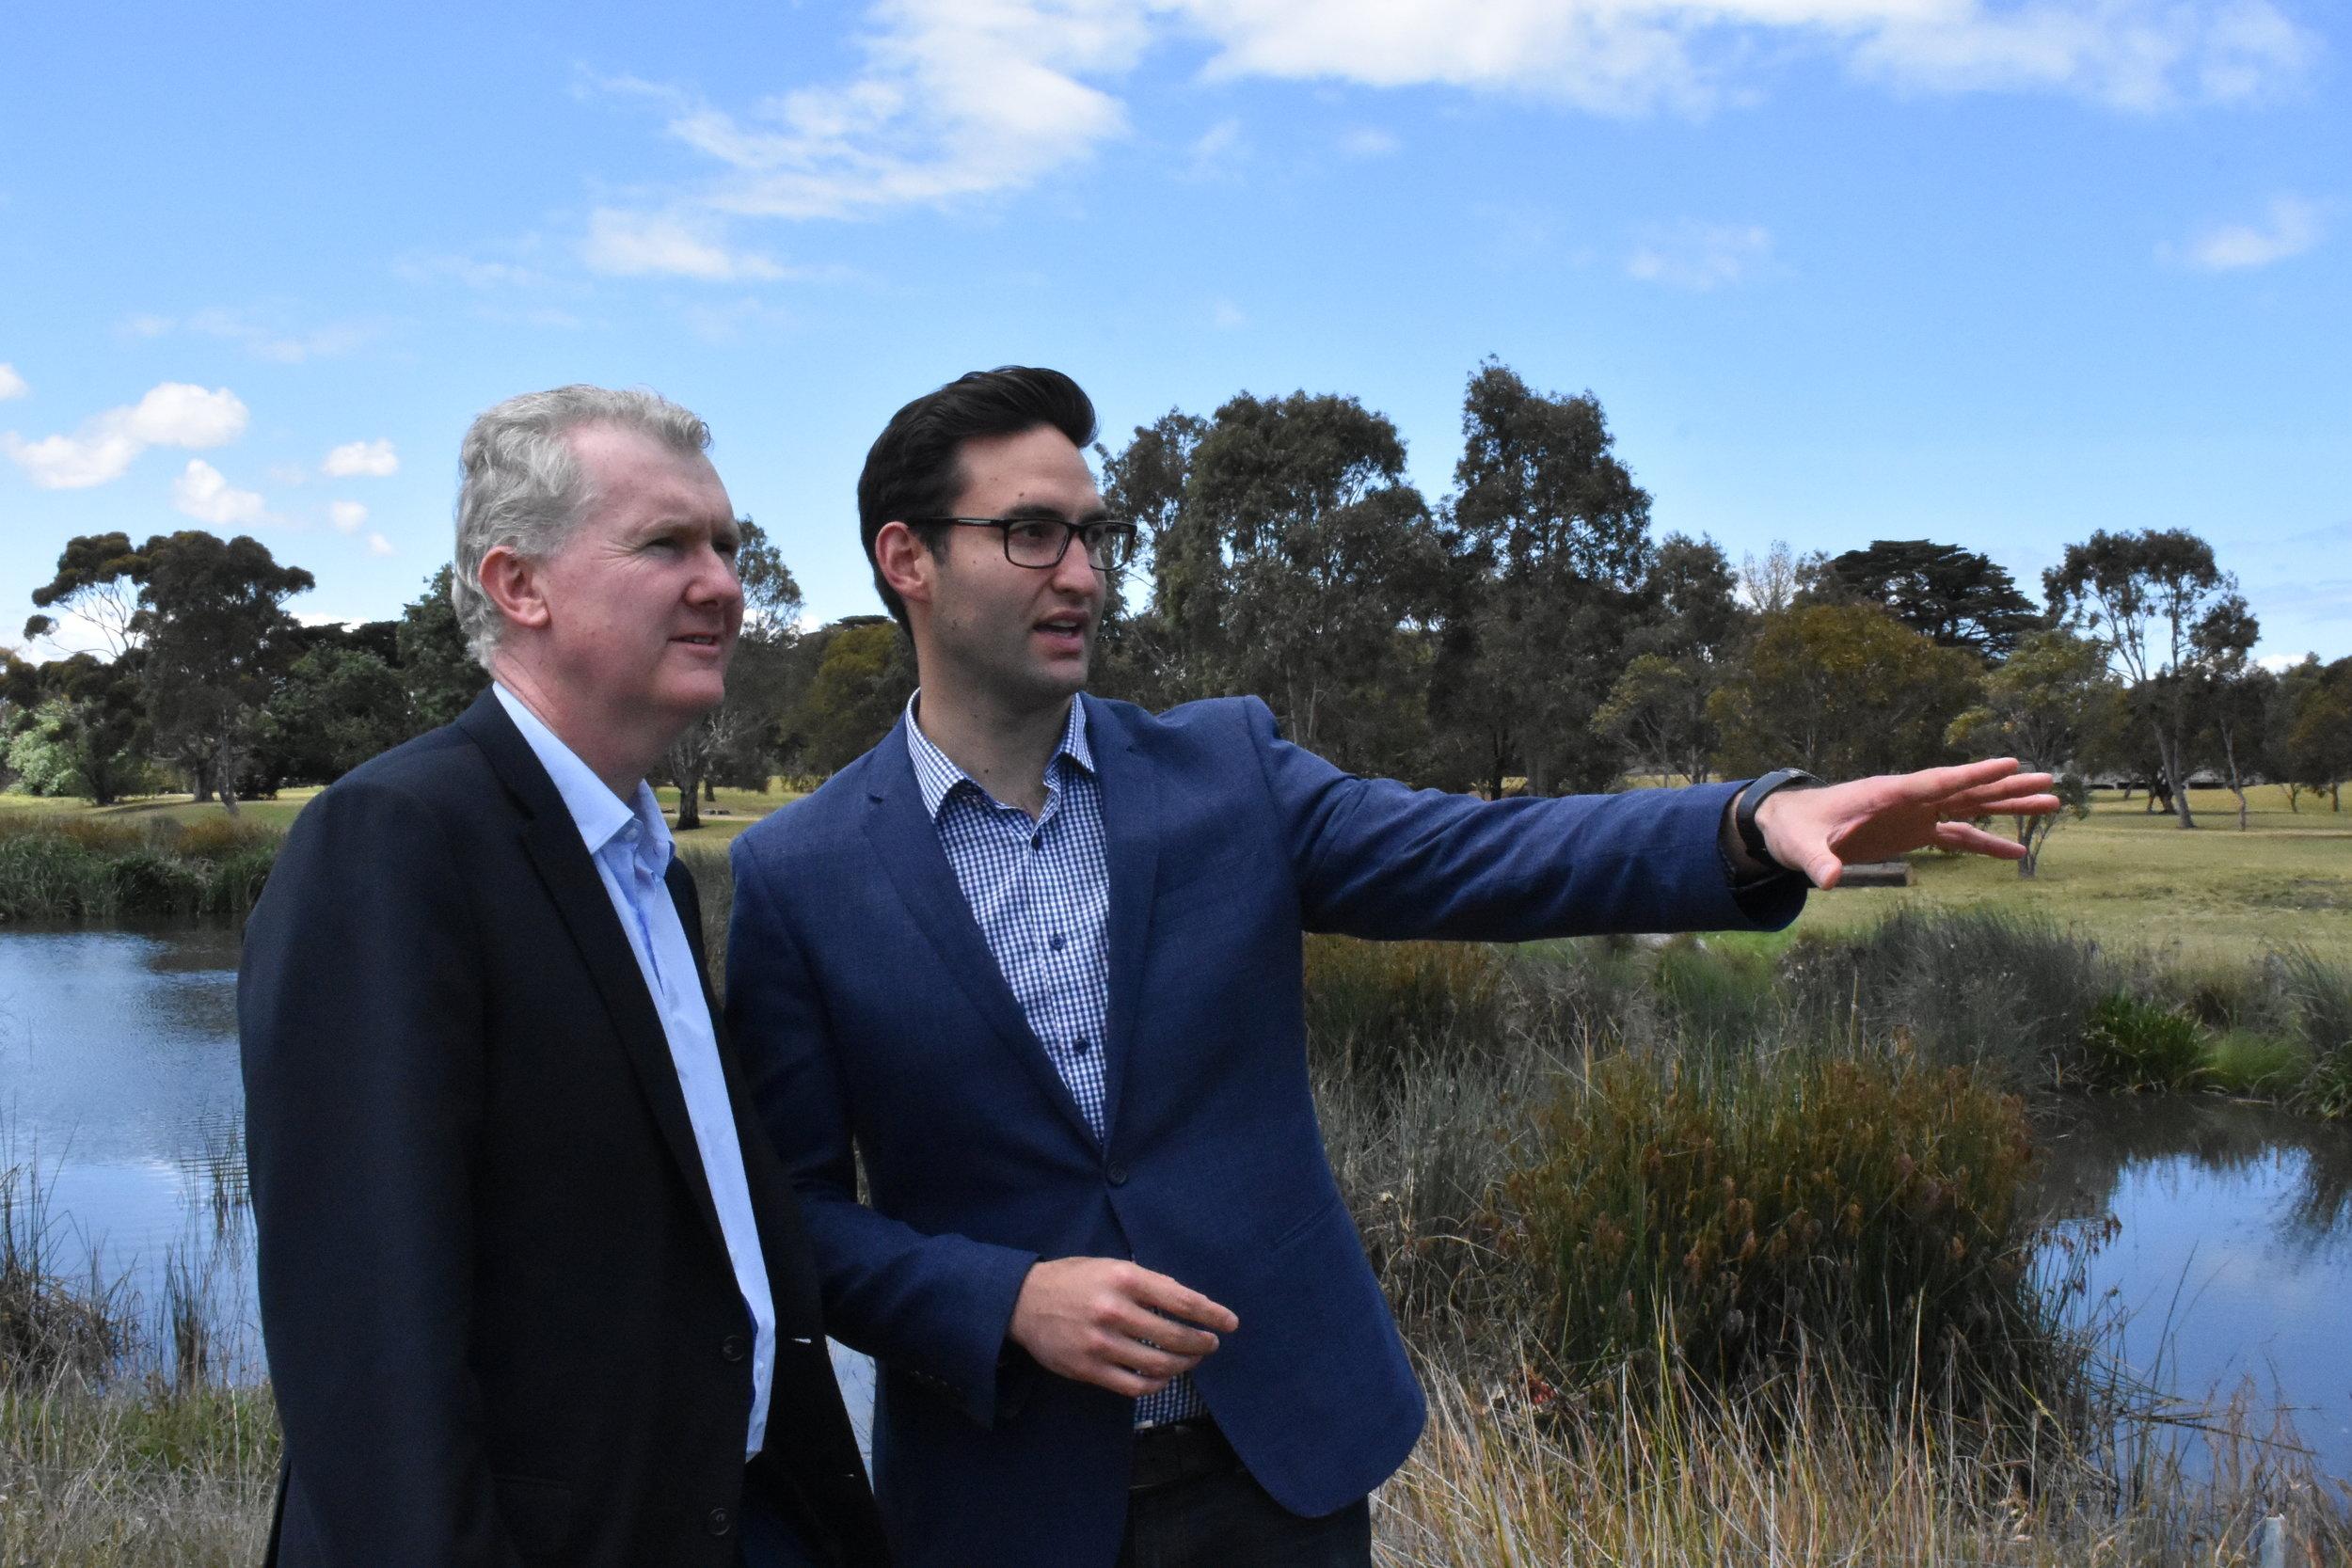 Tony Burke and Josh Burns, Labor Candidate for Macnamara